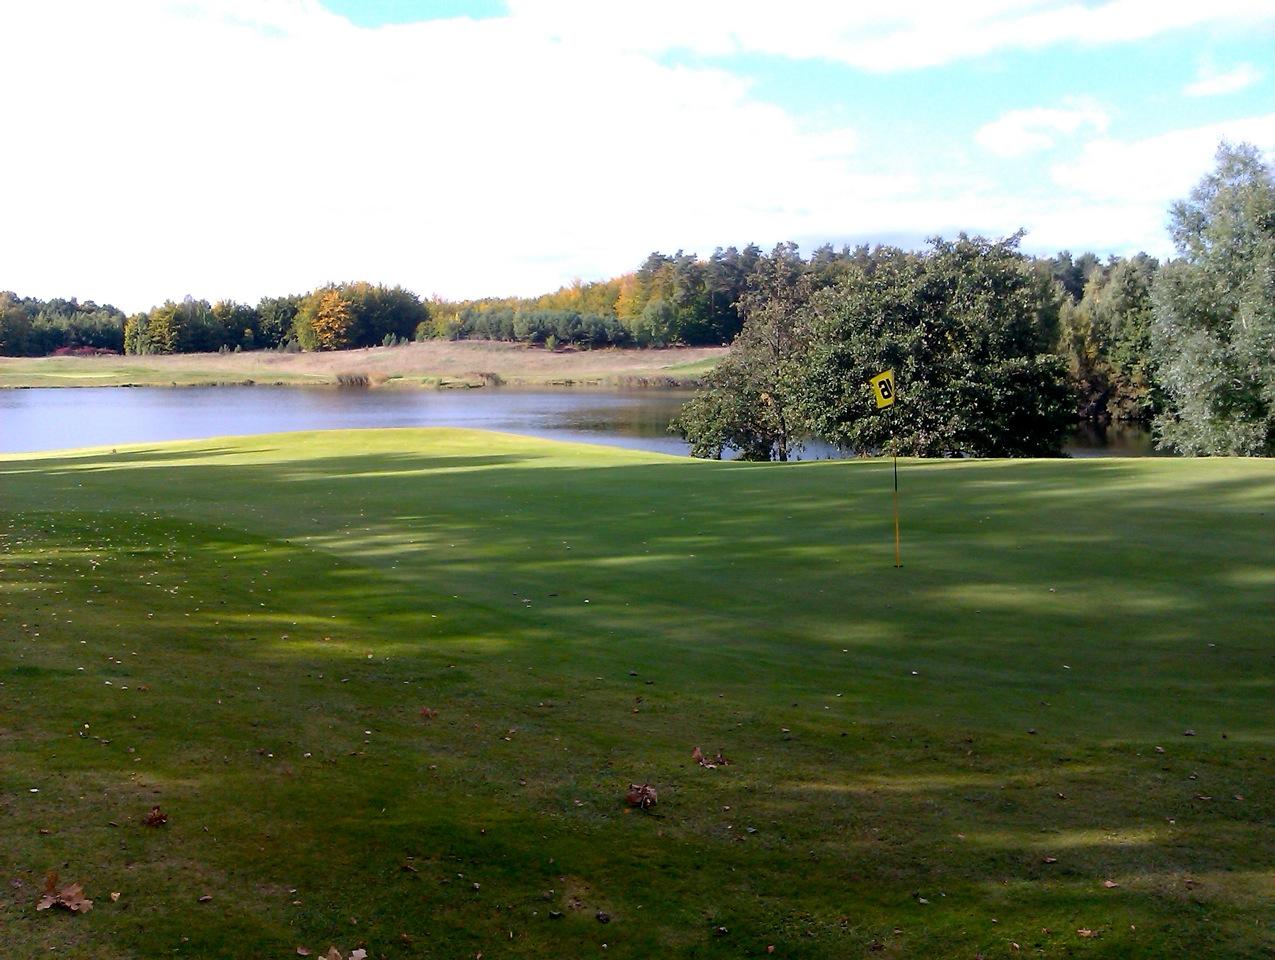 Gdansk Golf & Country Club, Loch 16: Blick vom Grün (Foto: Michael F. Basche)